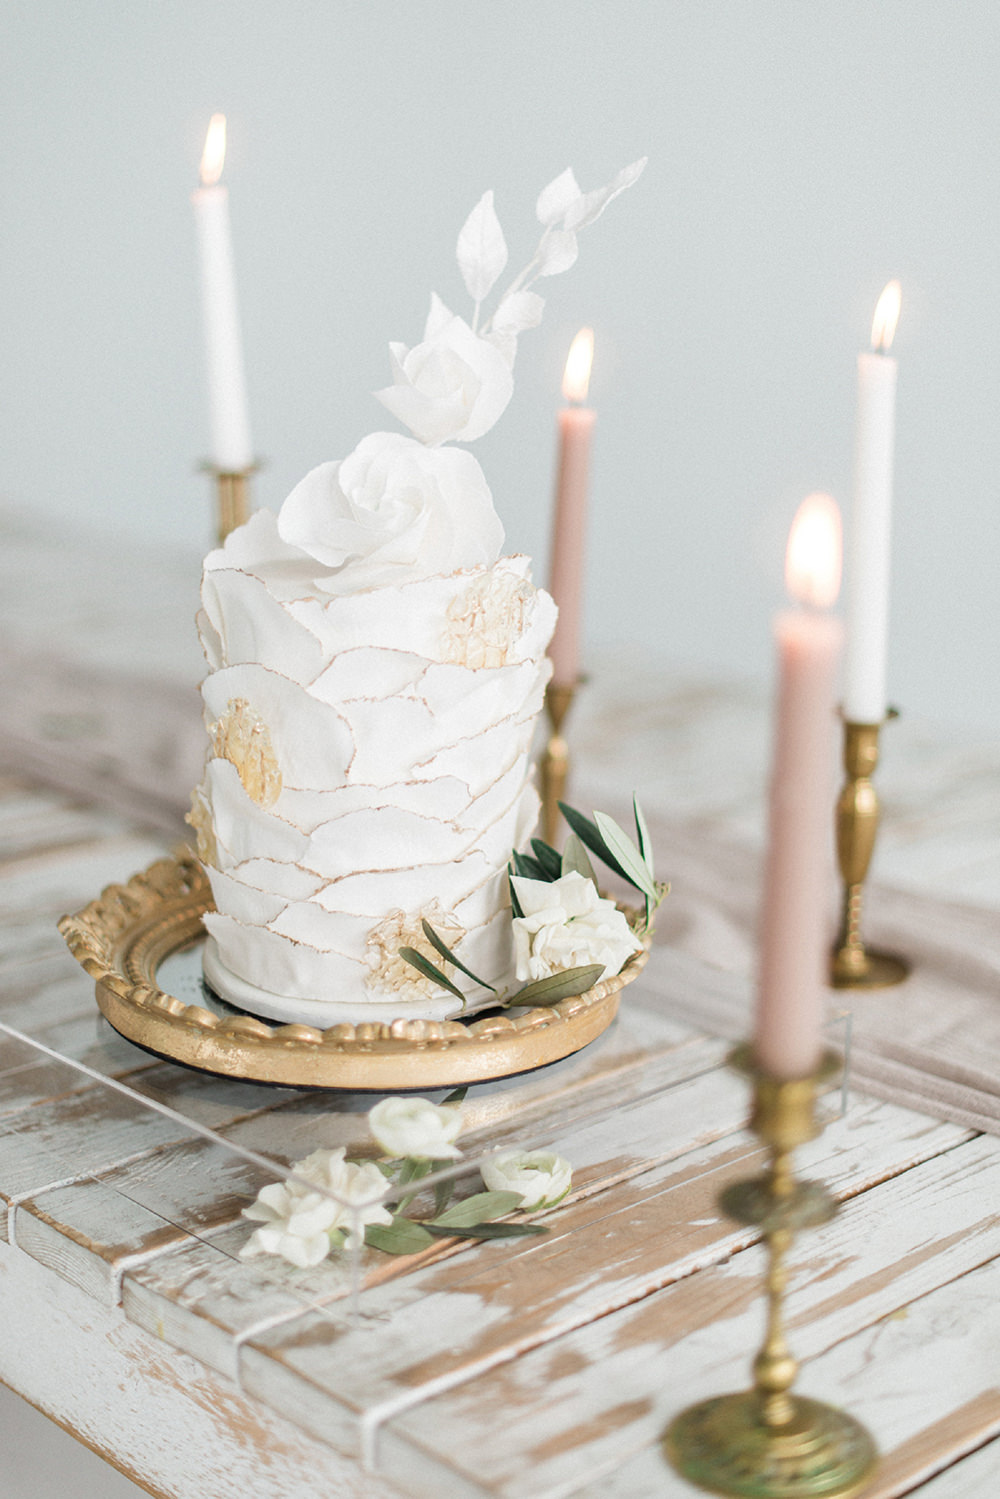 romantic wedding cakes - photo by Laura Kelly Photography http://ruffledblog.com/minimalist-monochrome-european-wedding-inspiration